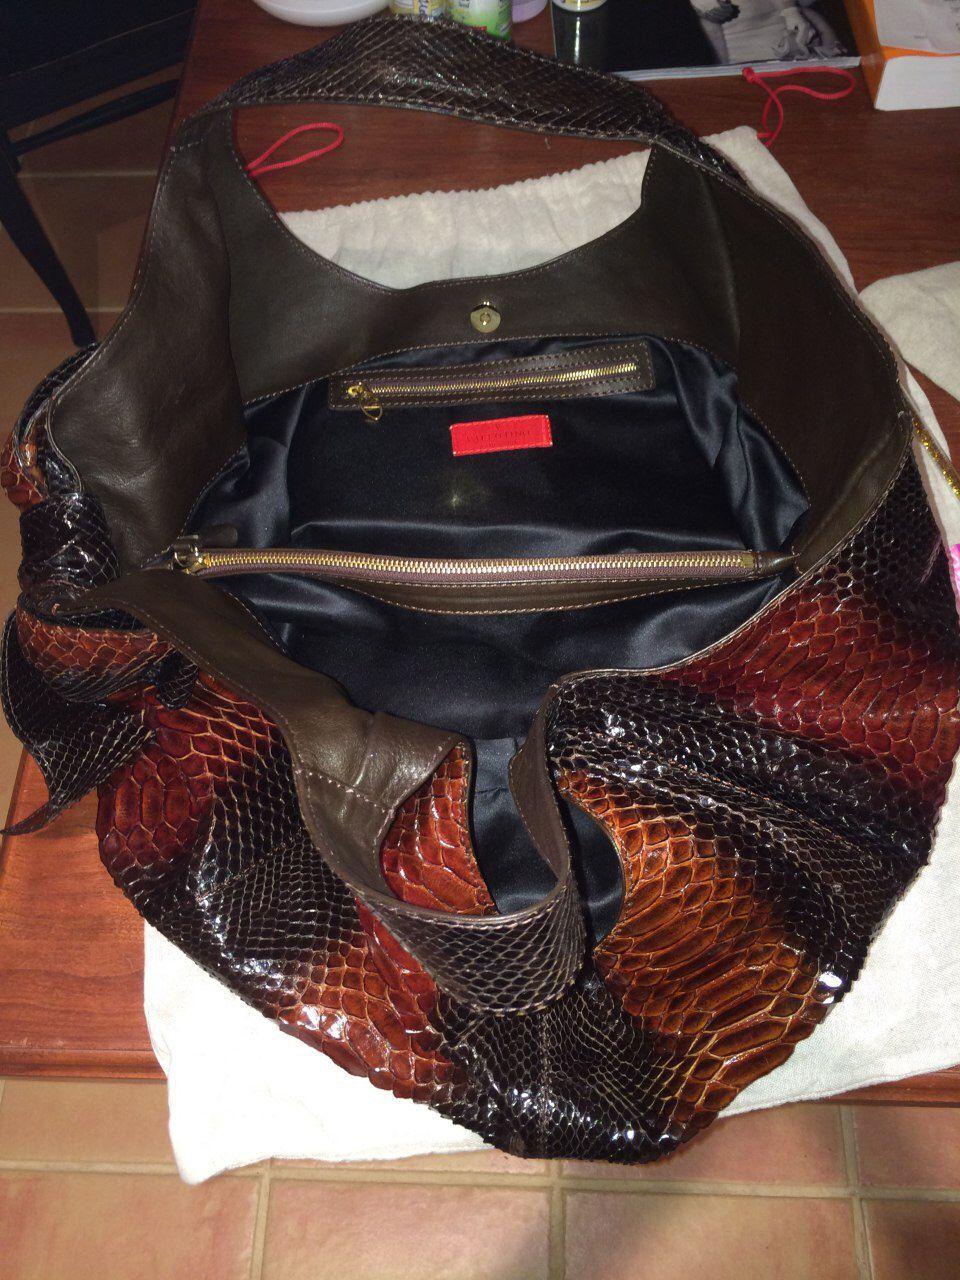 RARE Runway Snakeskin (Python) Shoulder Bag By Valentino